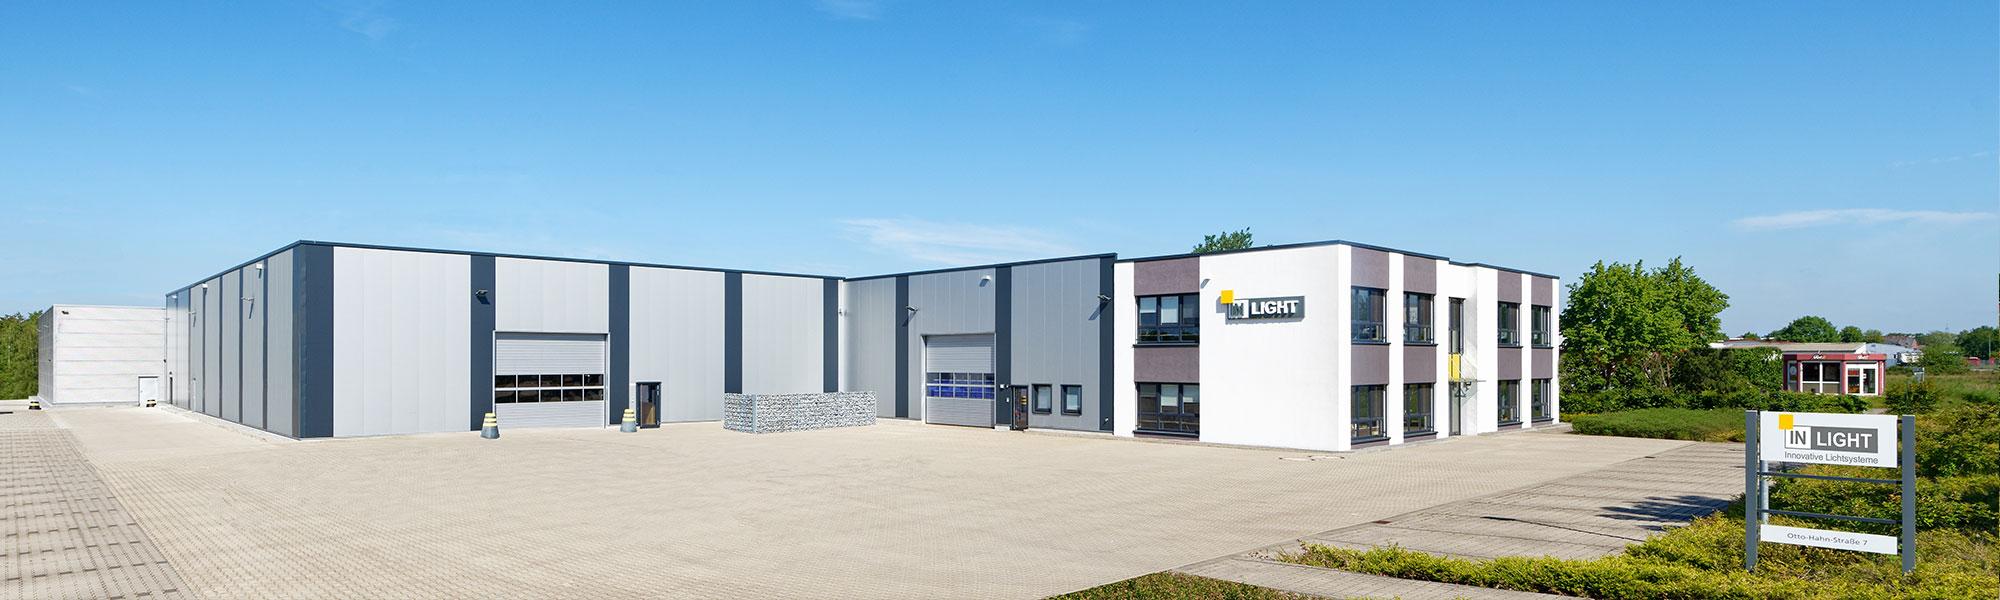 INLIGHT GmbH Gebäude